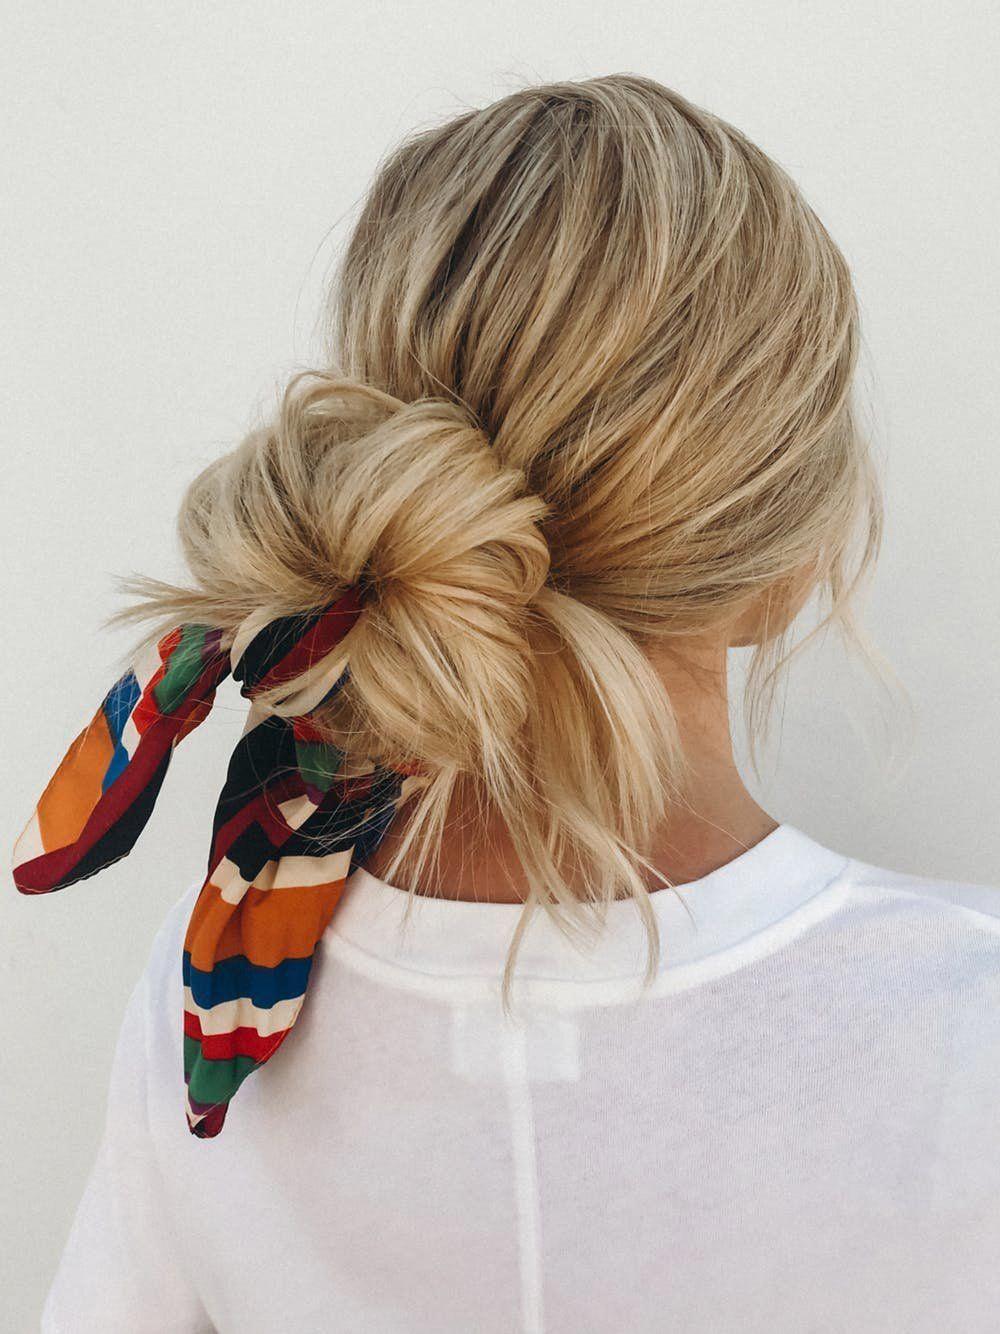 Easy Hairstyles By Self Easyhairstyles My Style Hair